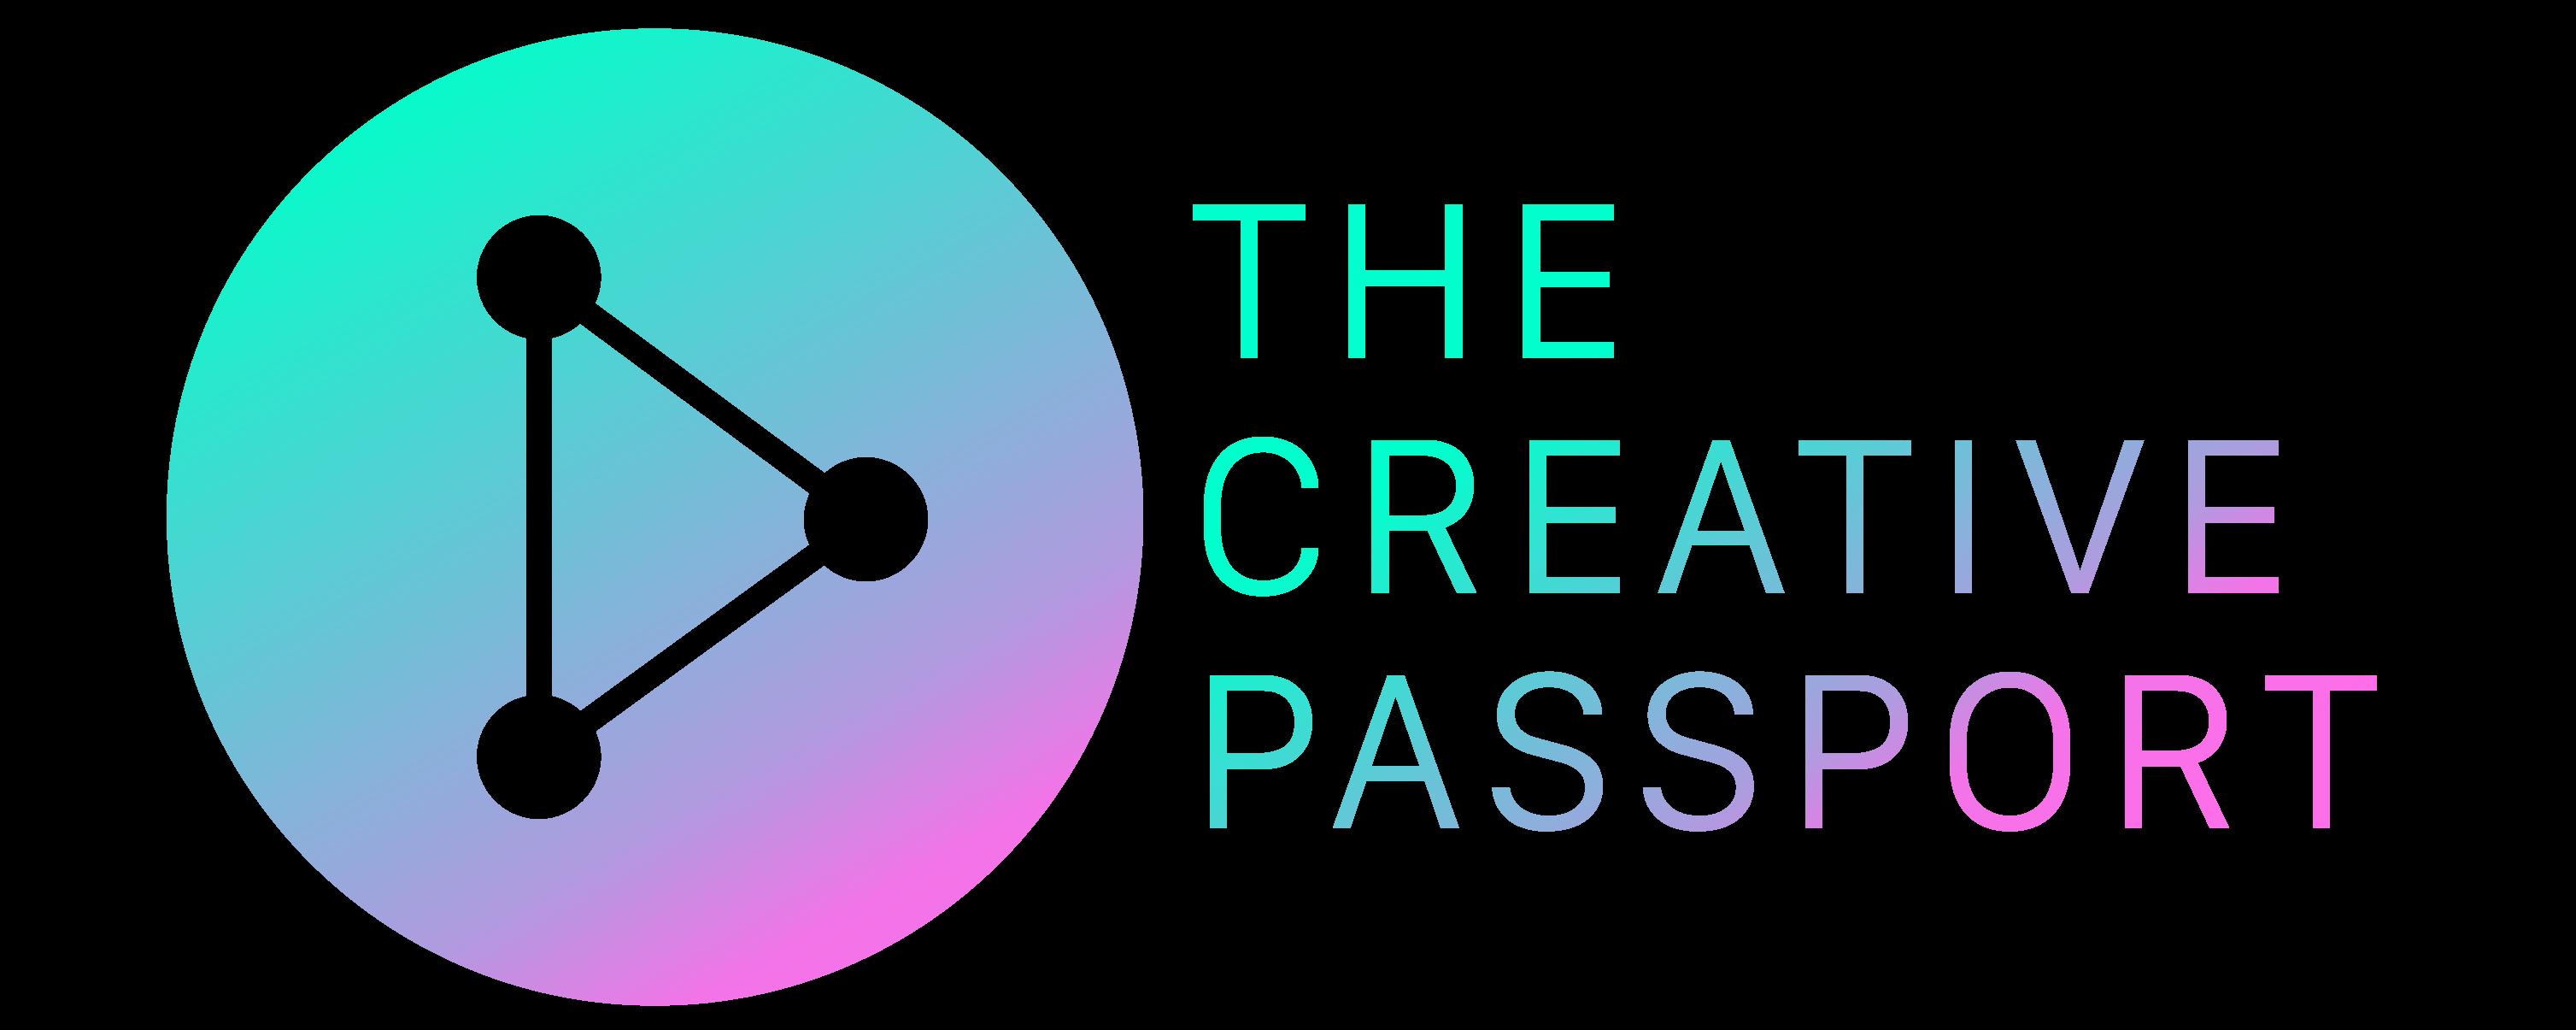 The Creative Passport